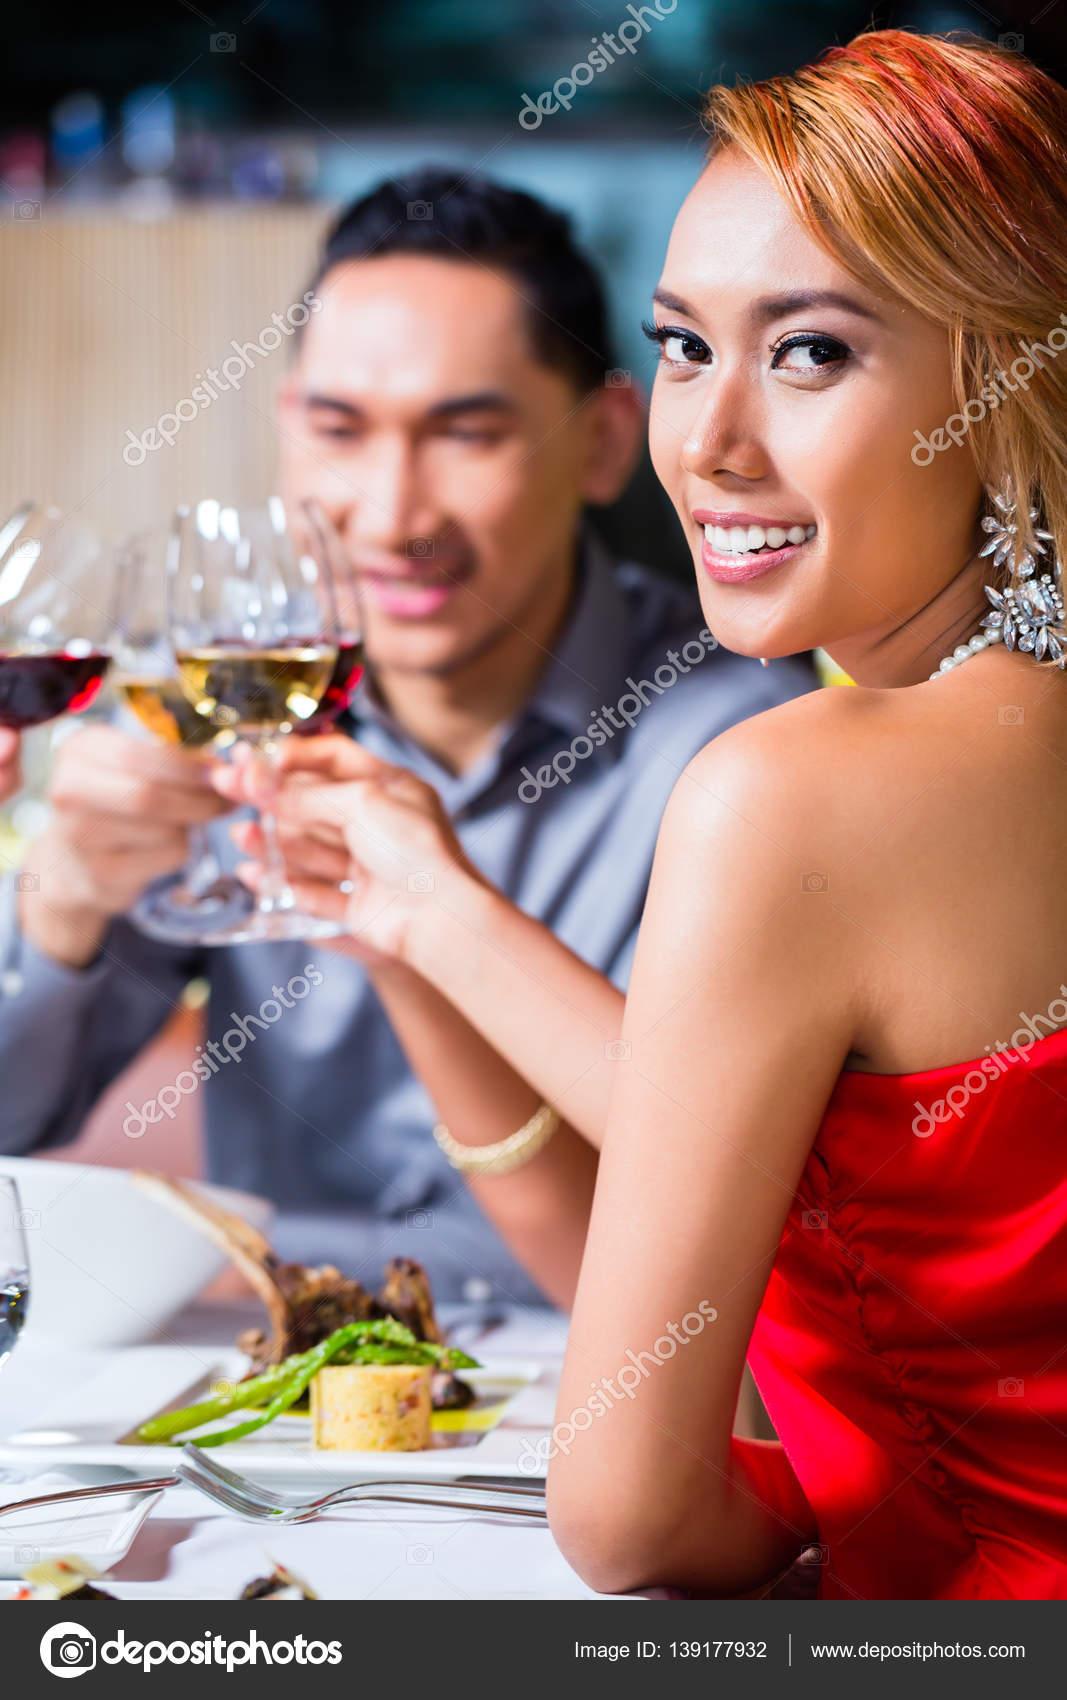 Diner dating service